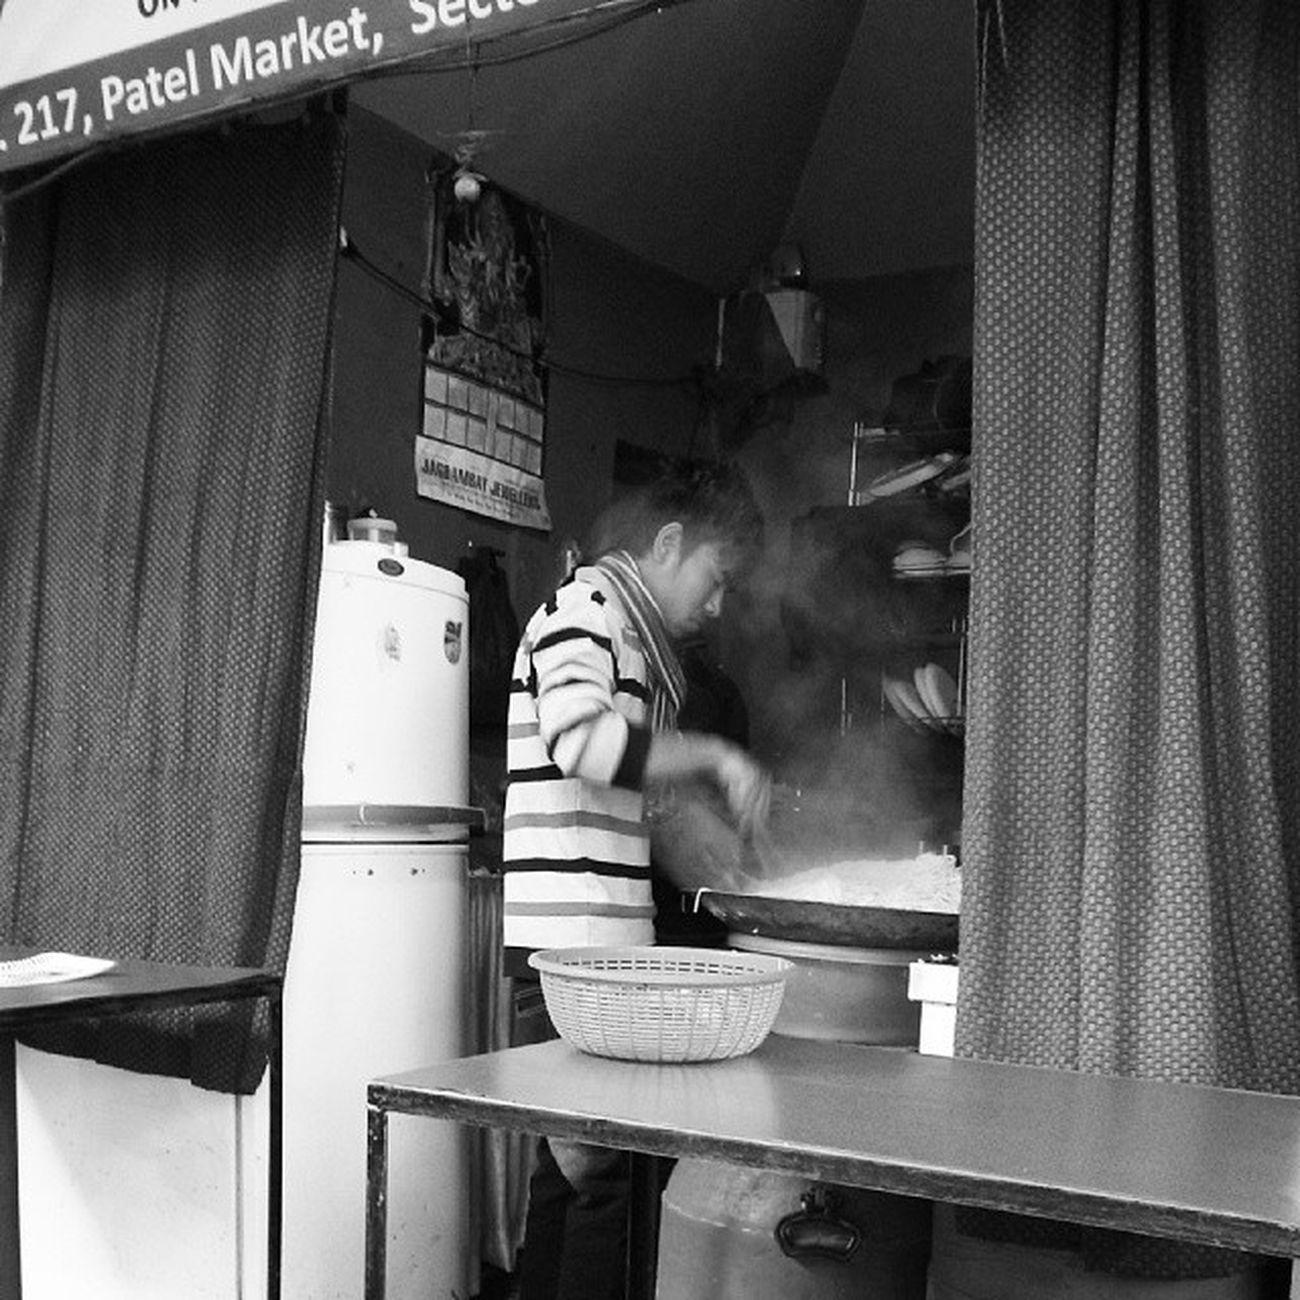 Peprations Morning Shop Peprations Noodles making chandigarh instapic